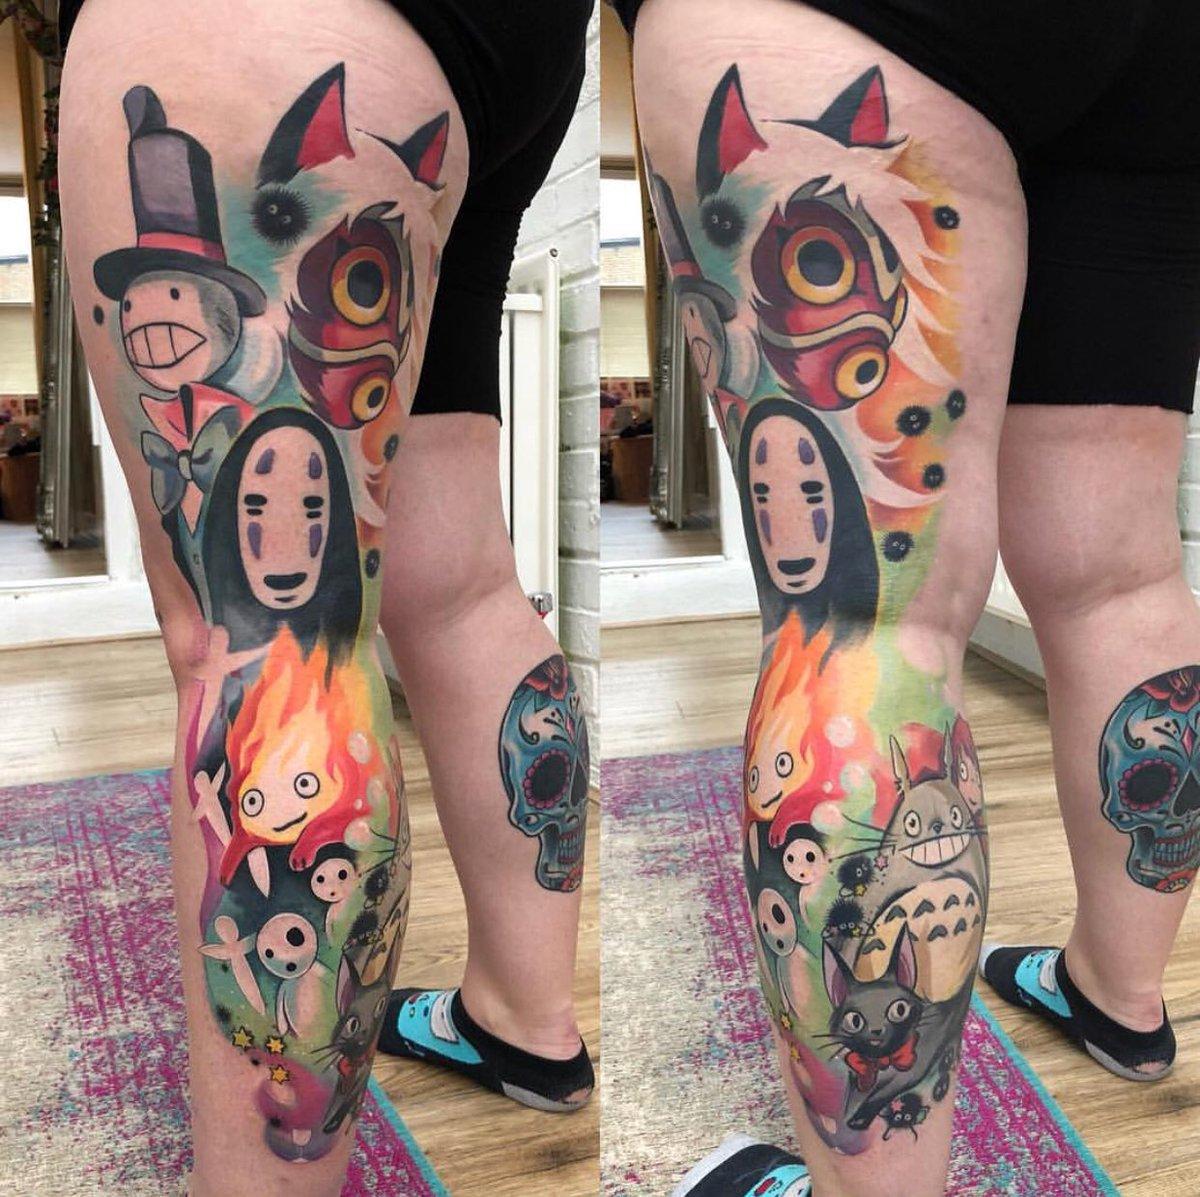 30d31420a Check out this epic #studioghibli #tattoo by shop owner @TiggyTattoos  #Ghibli #mononoke #Totoro #briarrosetattoo #colour #vibrant #bright  #animation #anime ...